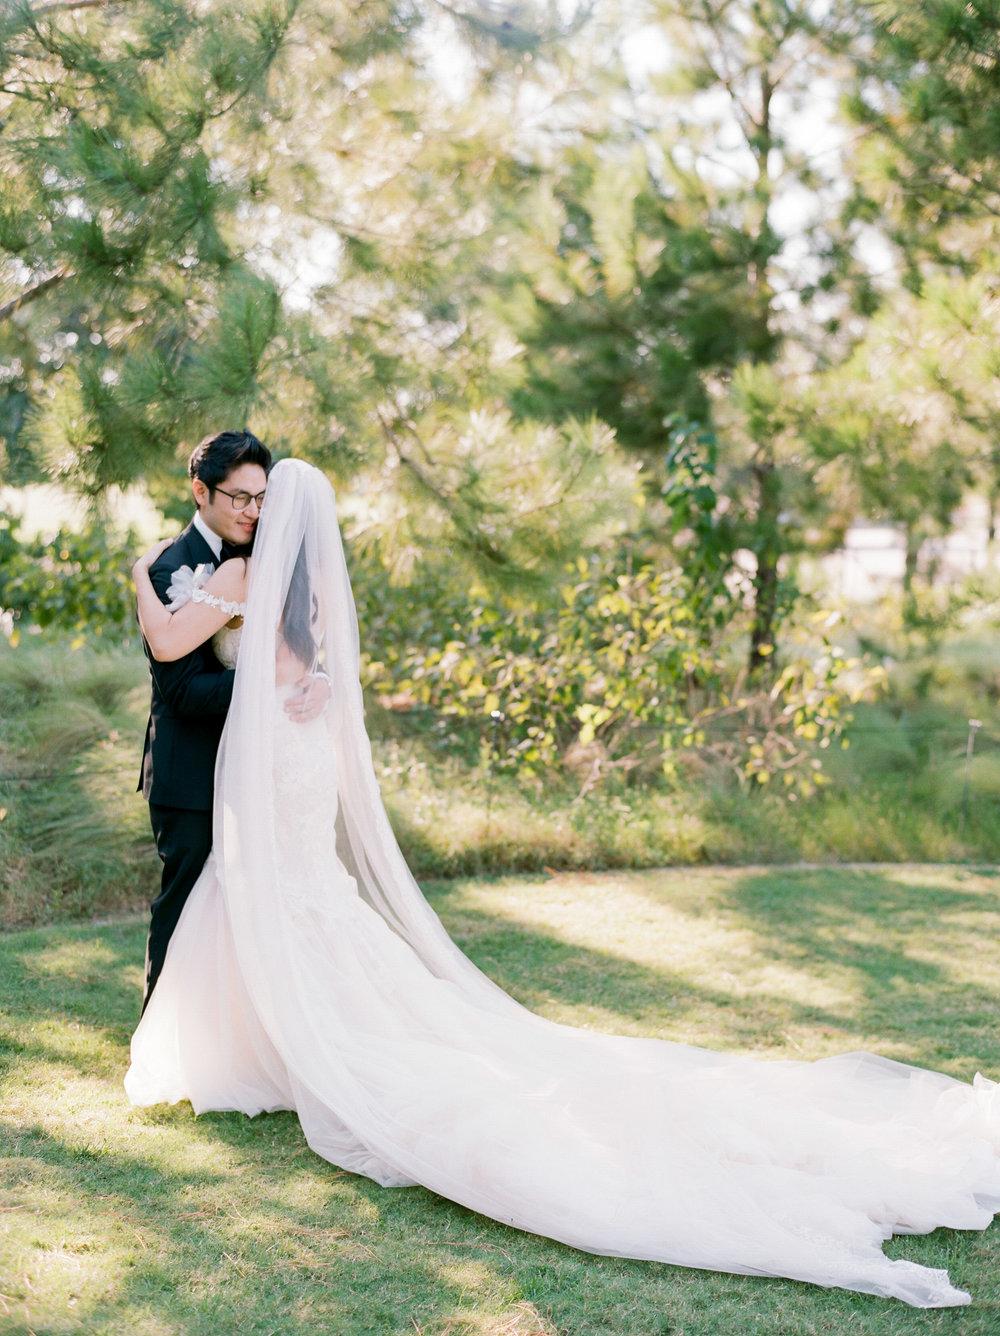 Martha-Stewart-Wedding-Dana-Fernandez-Photography-Josh-Texas-Film-Houston-Wedding-Fine-Art-Photographer-McGovern-Centennial-Gardens-Top-Best-14.jpg